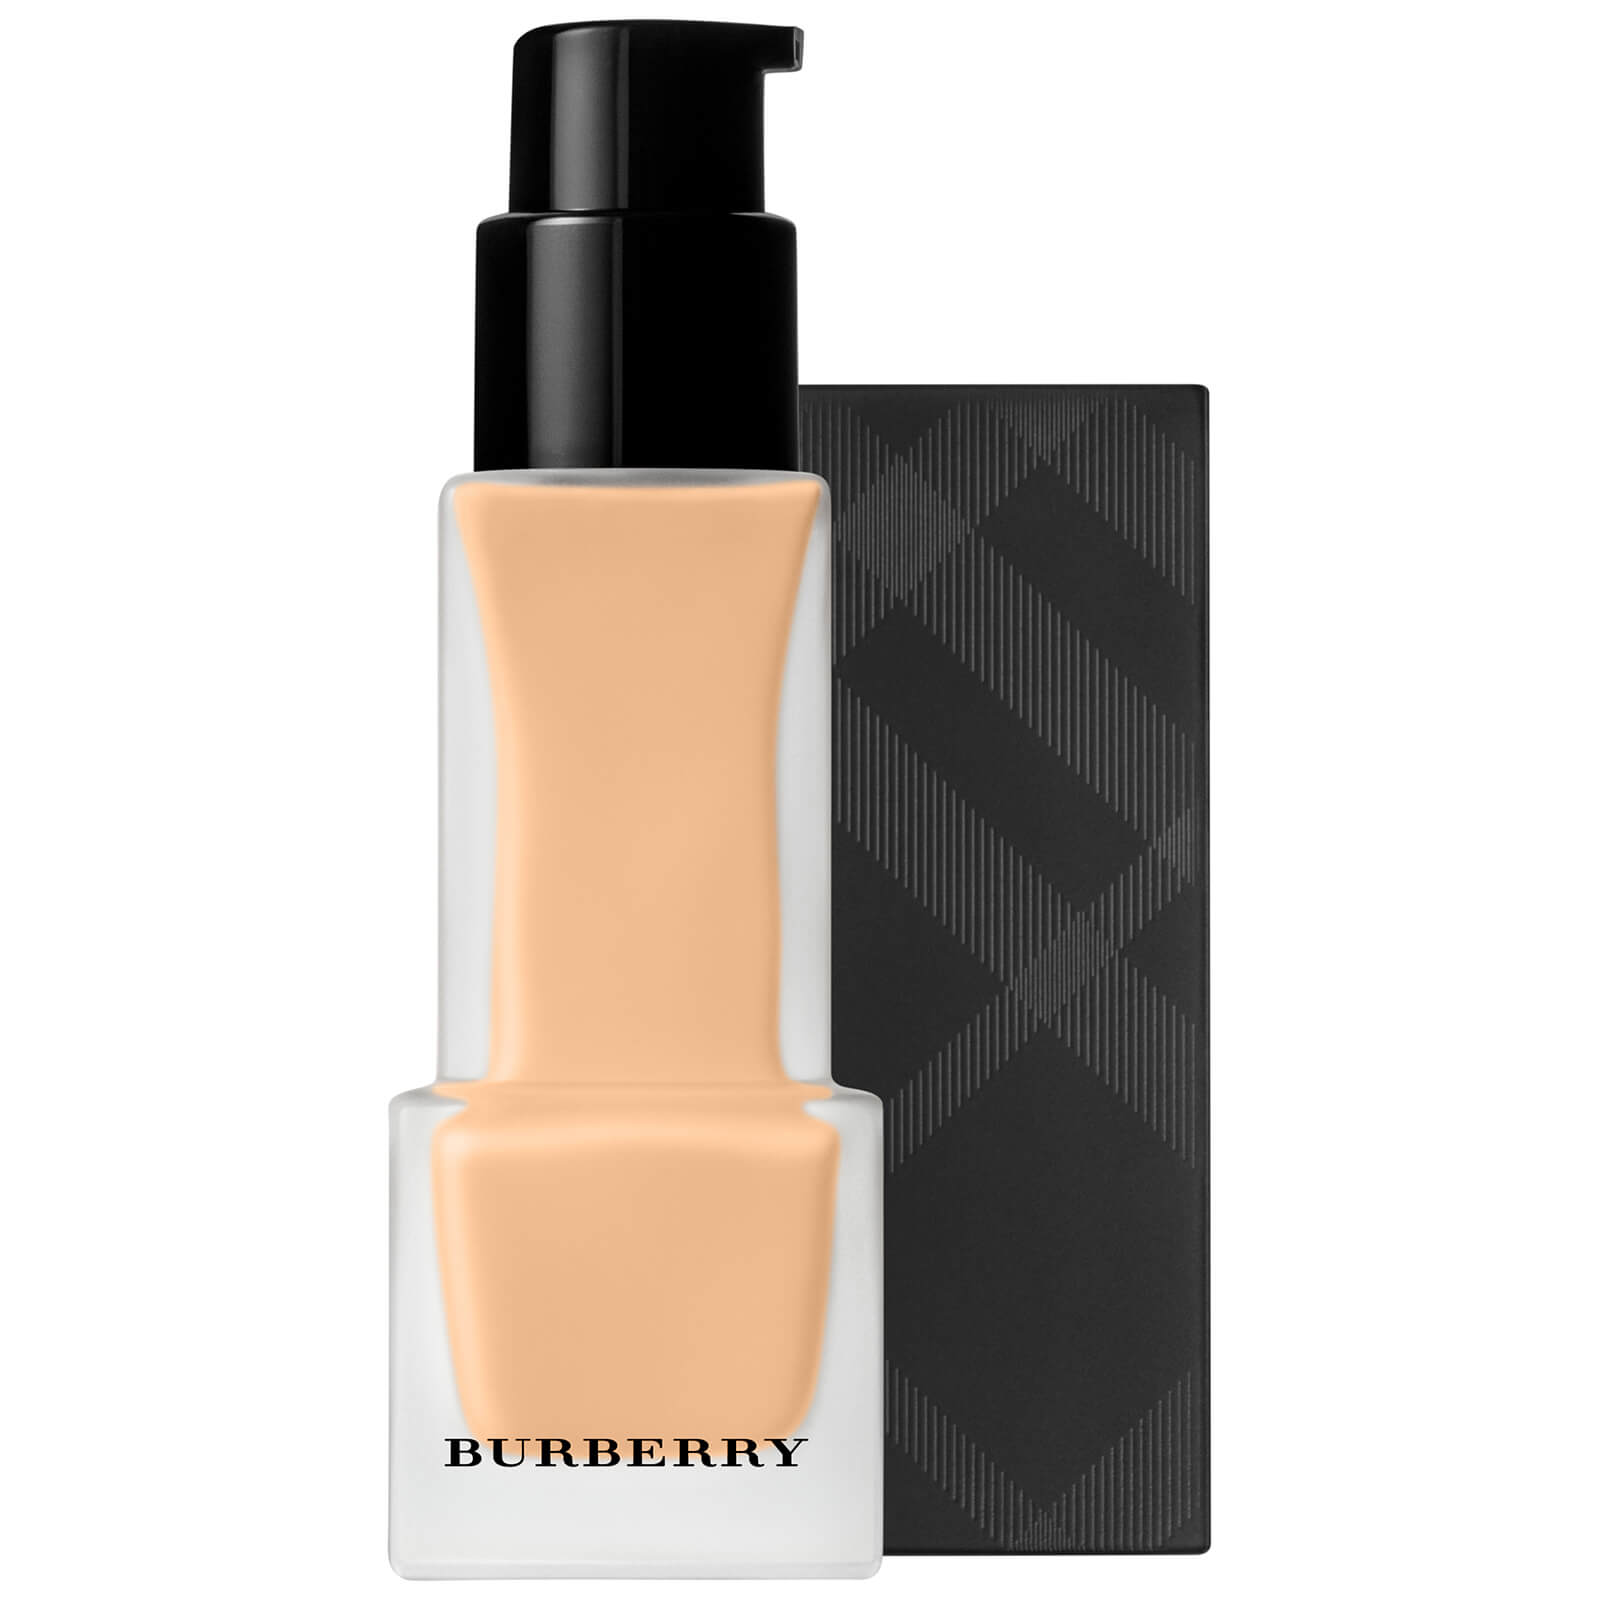 Burberry Matte Glow Fluid Foundation 30ml (Various Shades) - 20 Fair Warm